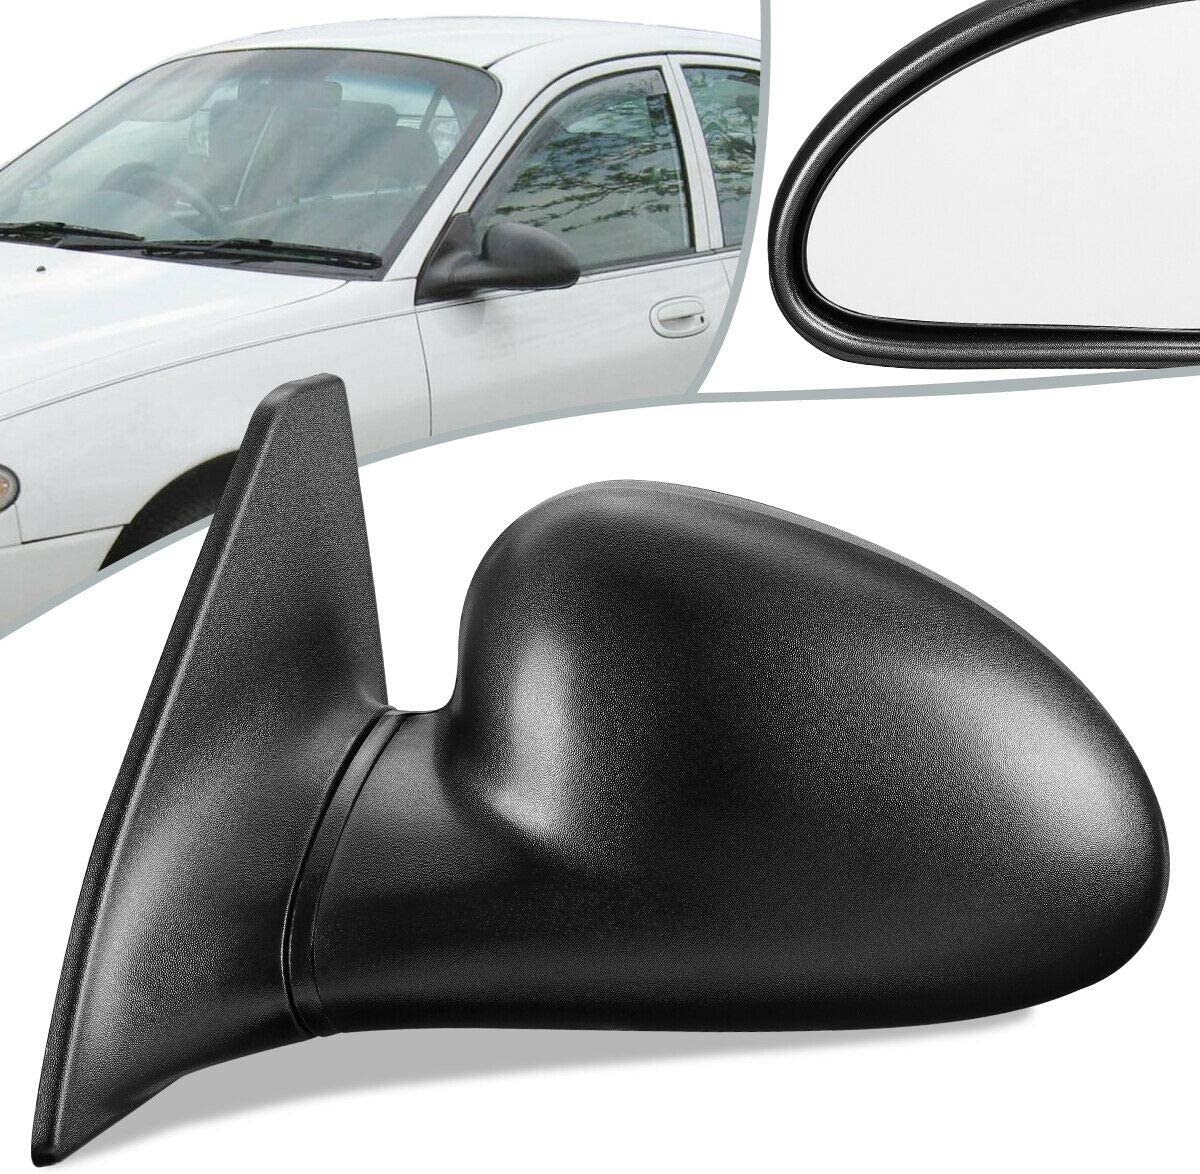 Superior Riseking Max 62% OFF Compatible with 1997-02 Sedan Escort Cou 1998-02